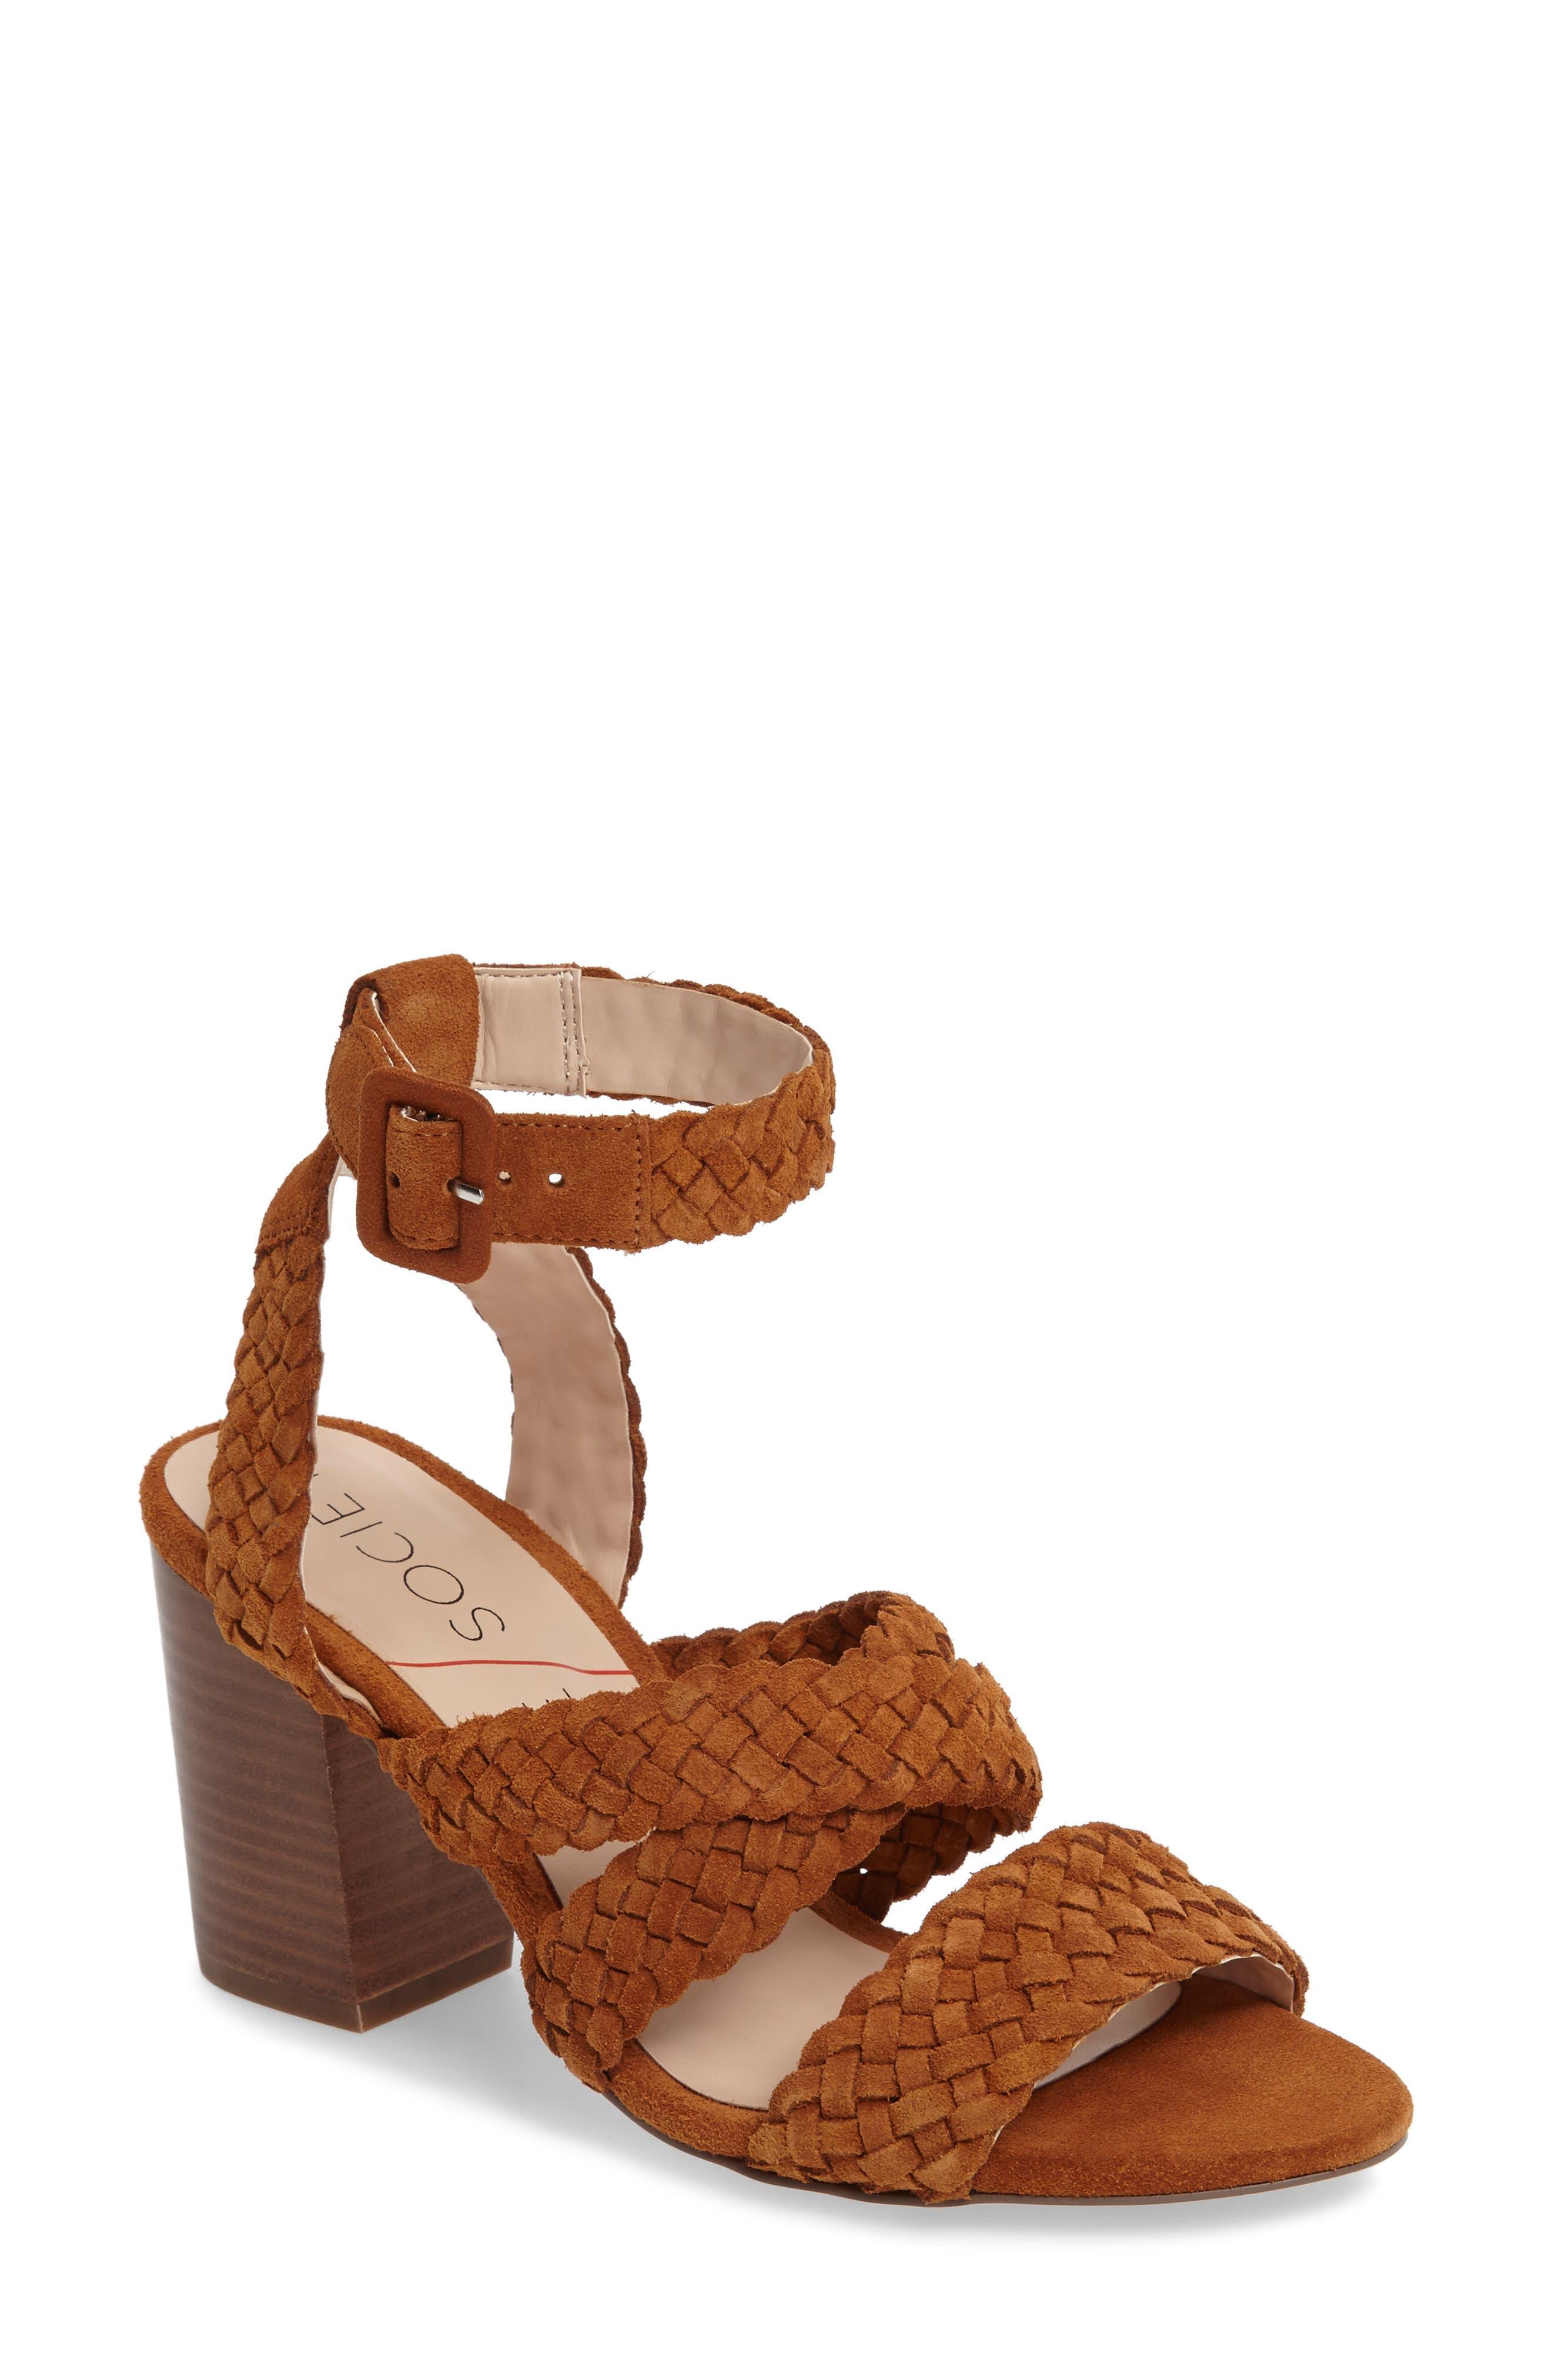 Evelina Block Heel Sandal,                             Main thumbnail 1, color,                             Chestnut